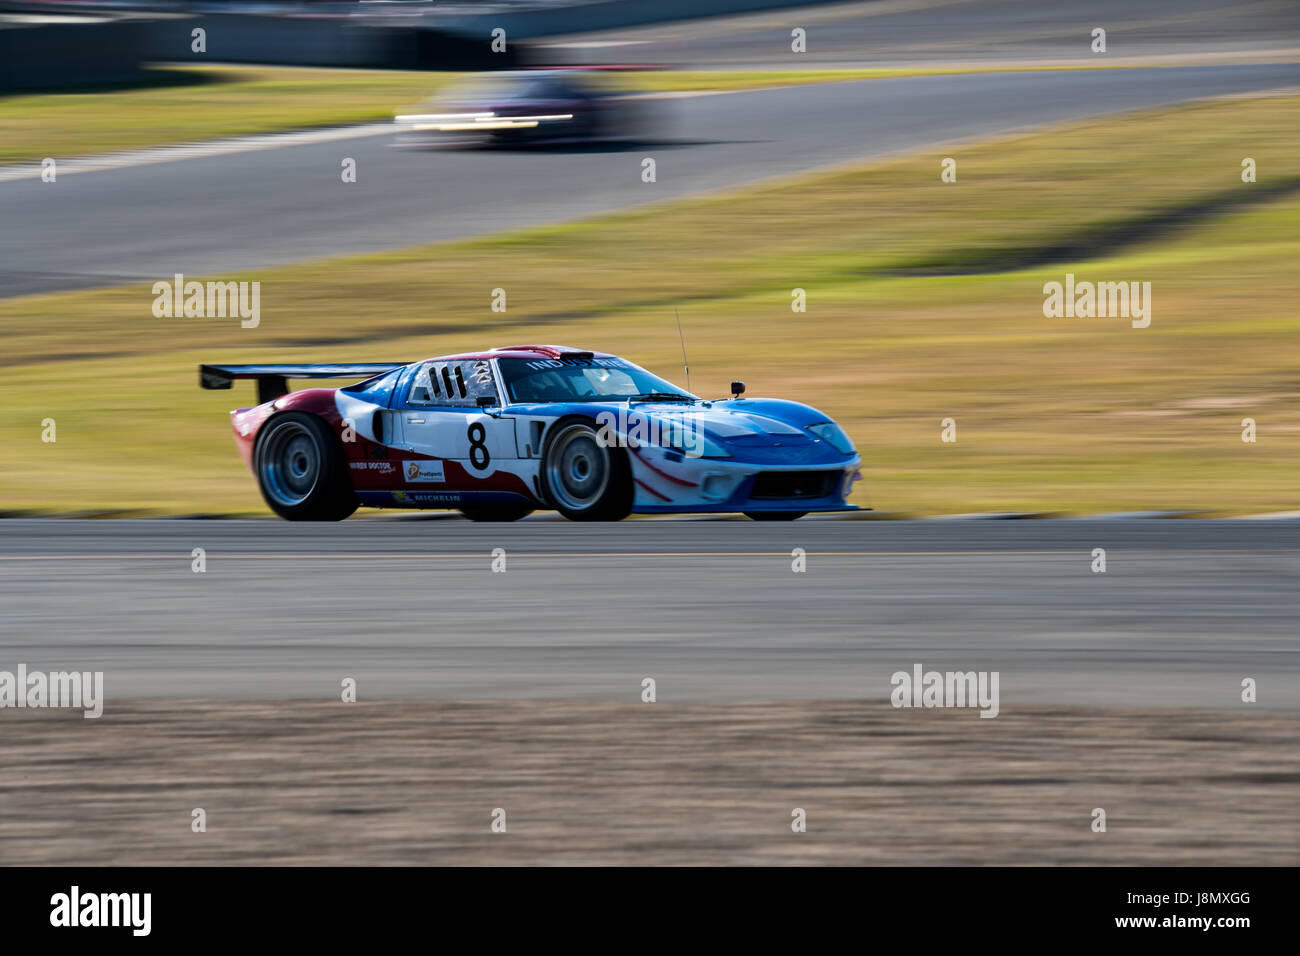 Motorsport-Park Sydney, Australien. 28. Mai 2017.  Gerade 8 Racing GT40. Anthony fesselte/Alamy Live-Nachrichten Stockbild